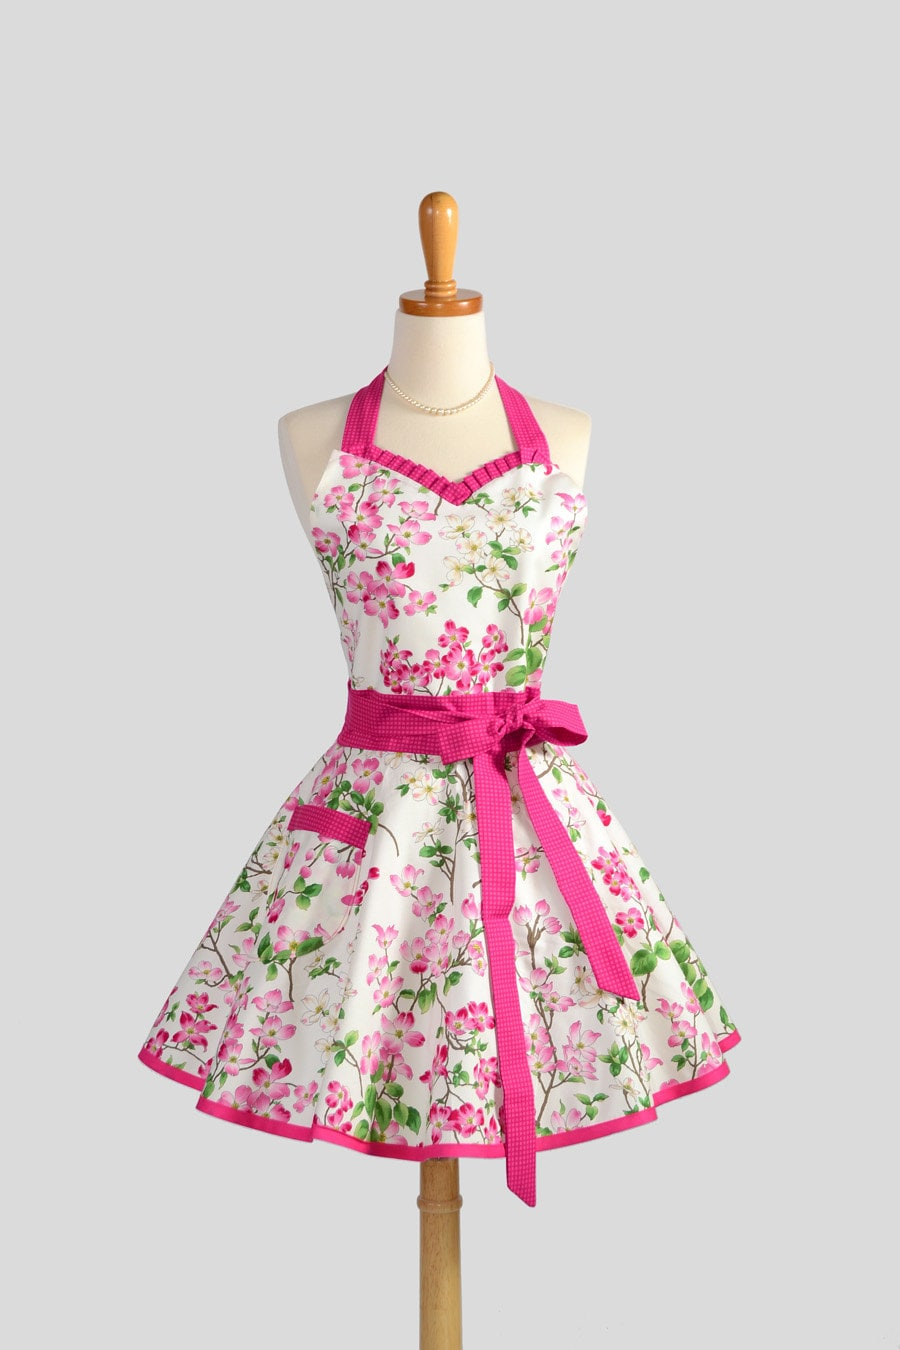 sweetheart retro apron handmade sexy womens apron in cute. Black Bedroom Furniture Sets. Home Design Ideas